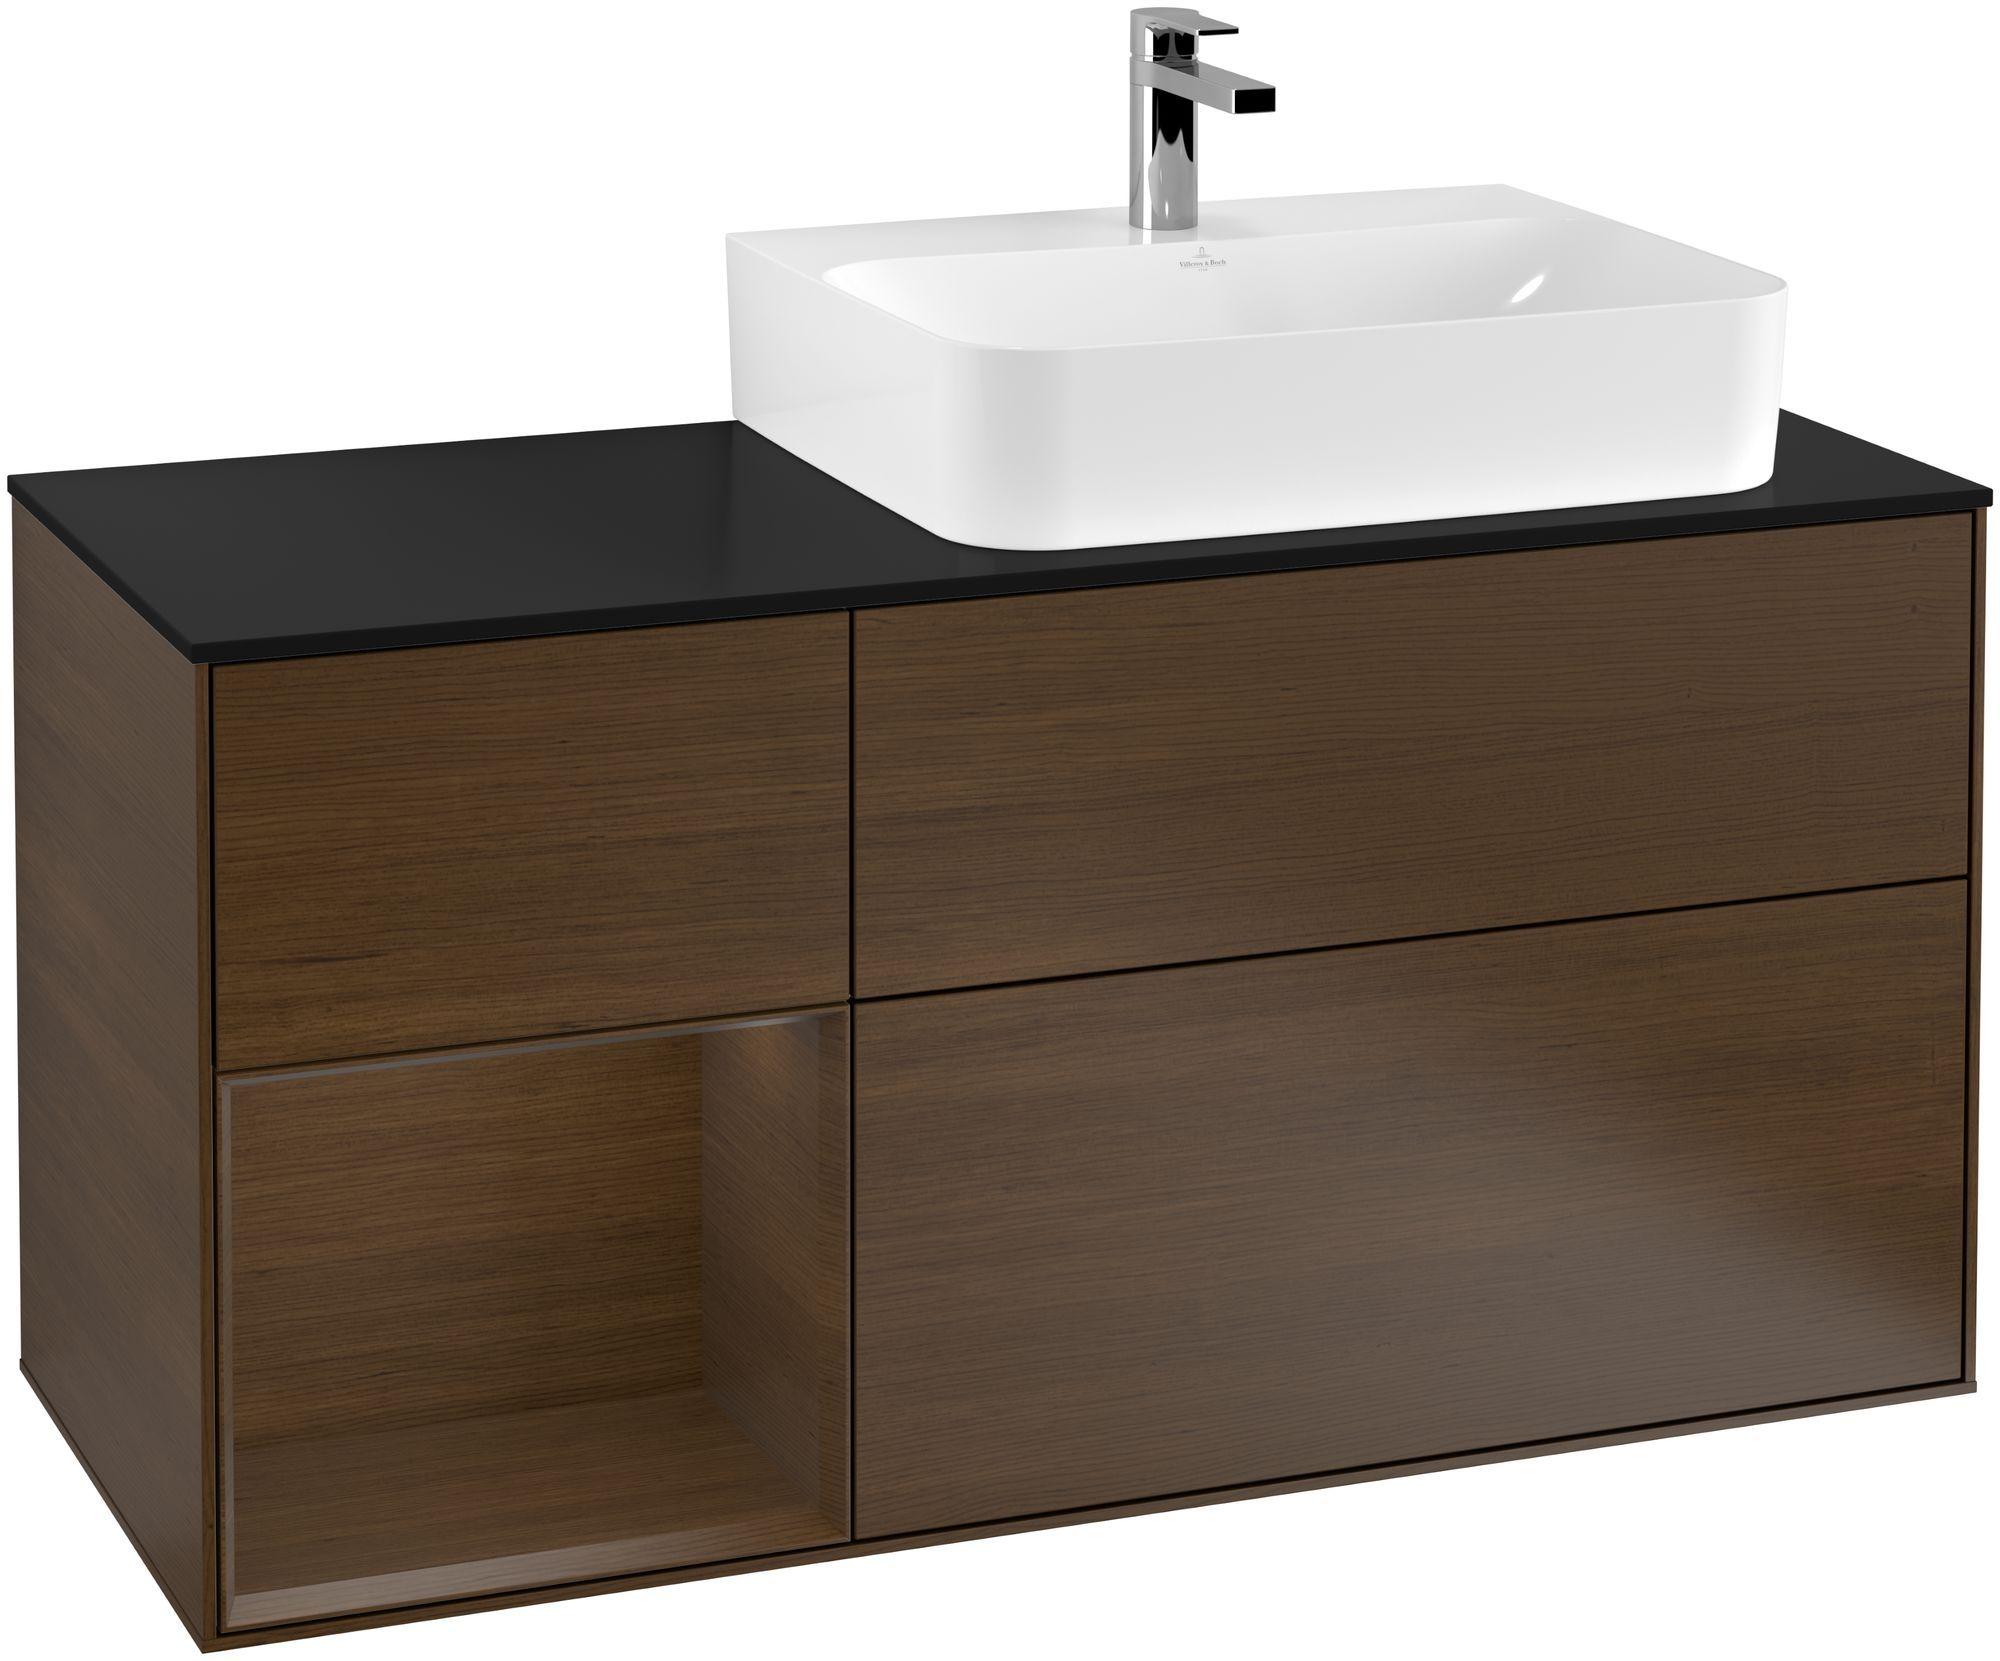 Villeroy & Boch Finion G14 Waschtischunterschrank mit Regalelement 3 Auszüge Waschtisch rechts LED-Beleuchtung B:120xH:60,3xT:50,1cm Front, Korpus: Walnut Veneer, Glasplatte: Black Matt G142GNGN